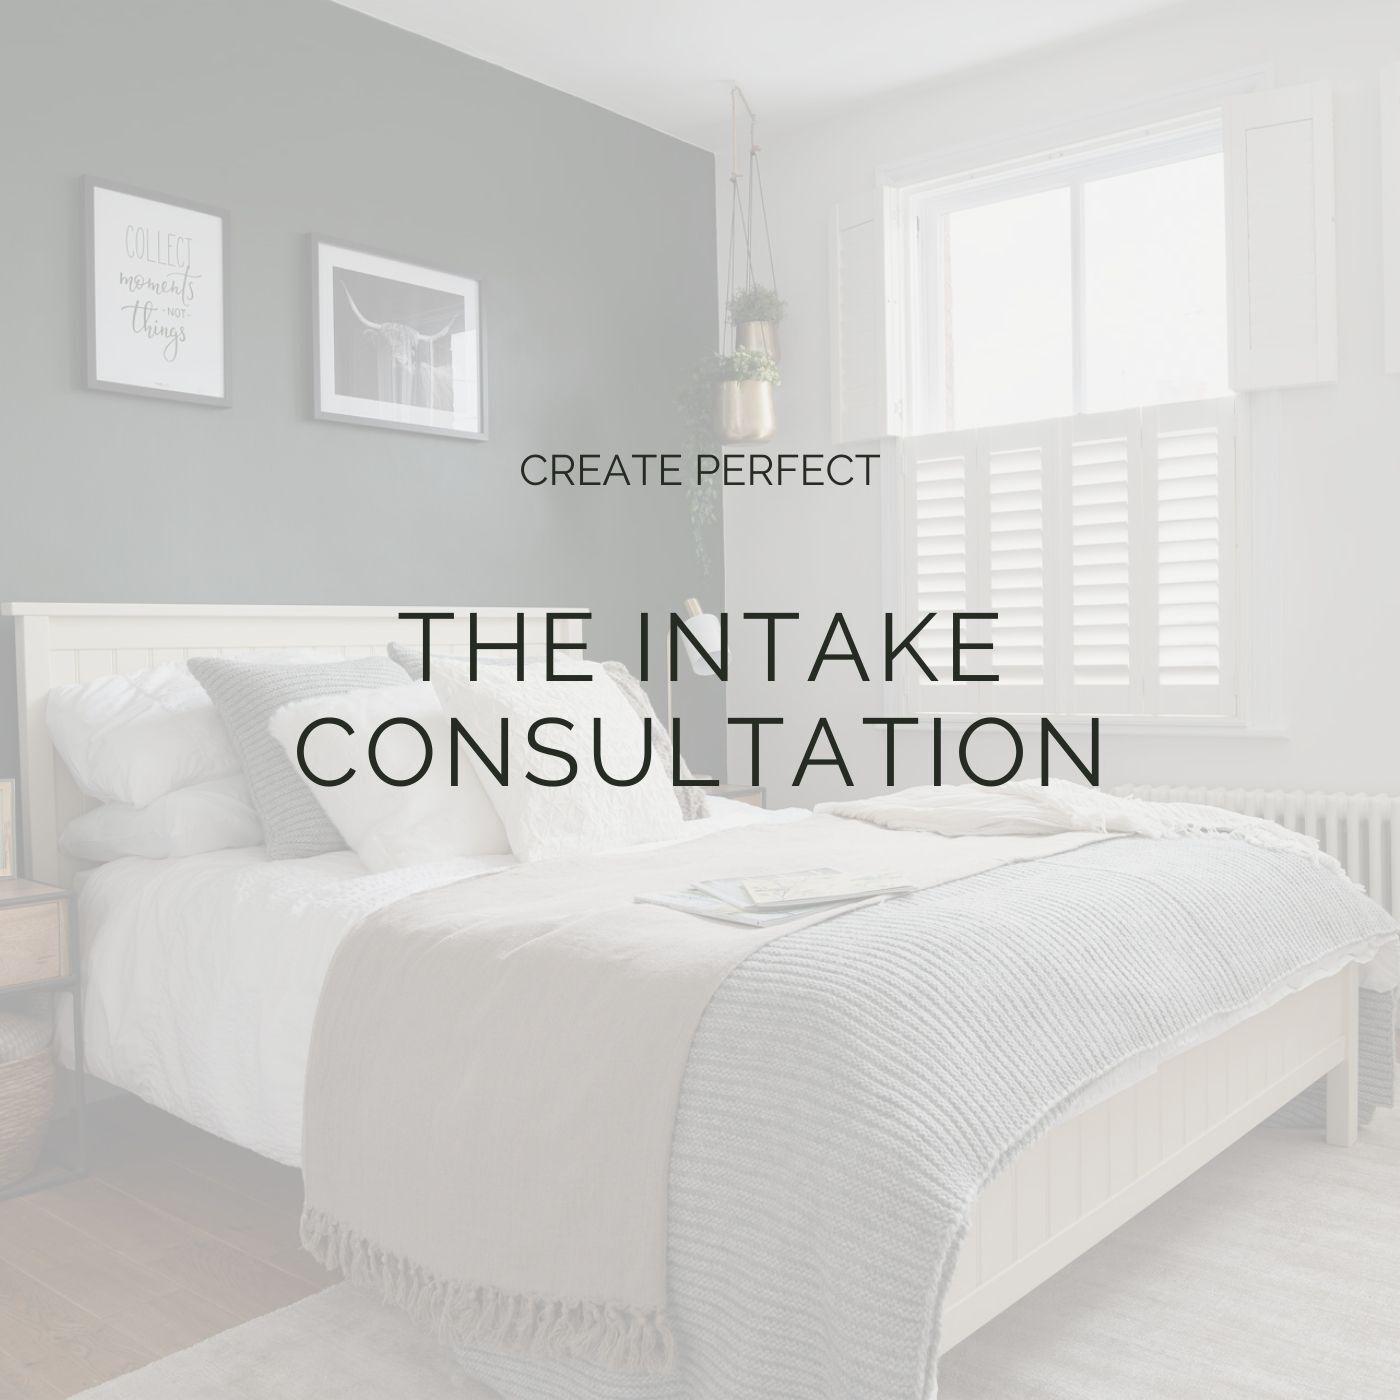 The intake consultation.jpg